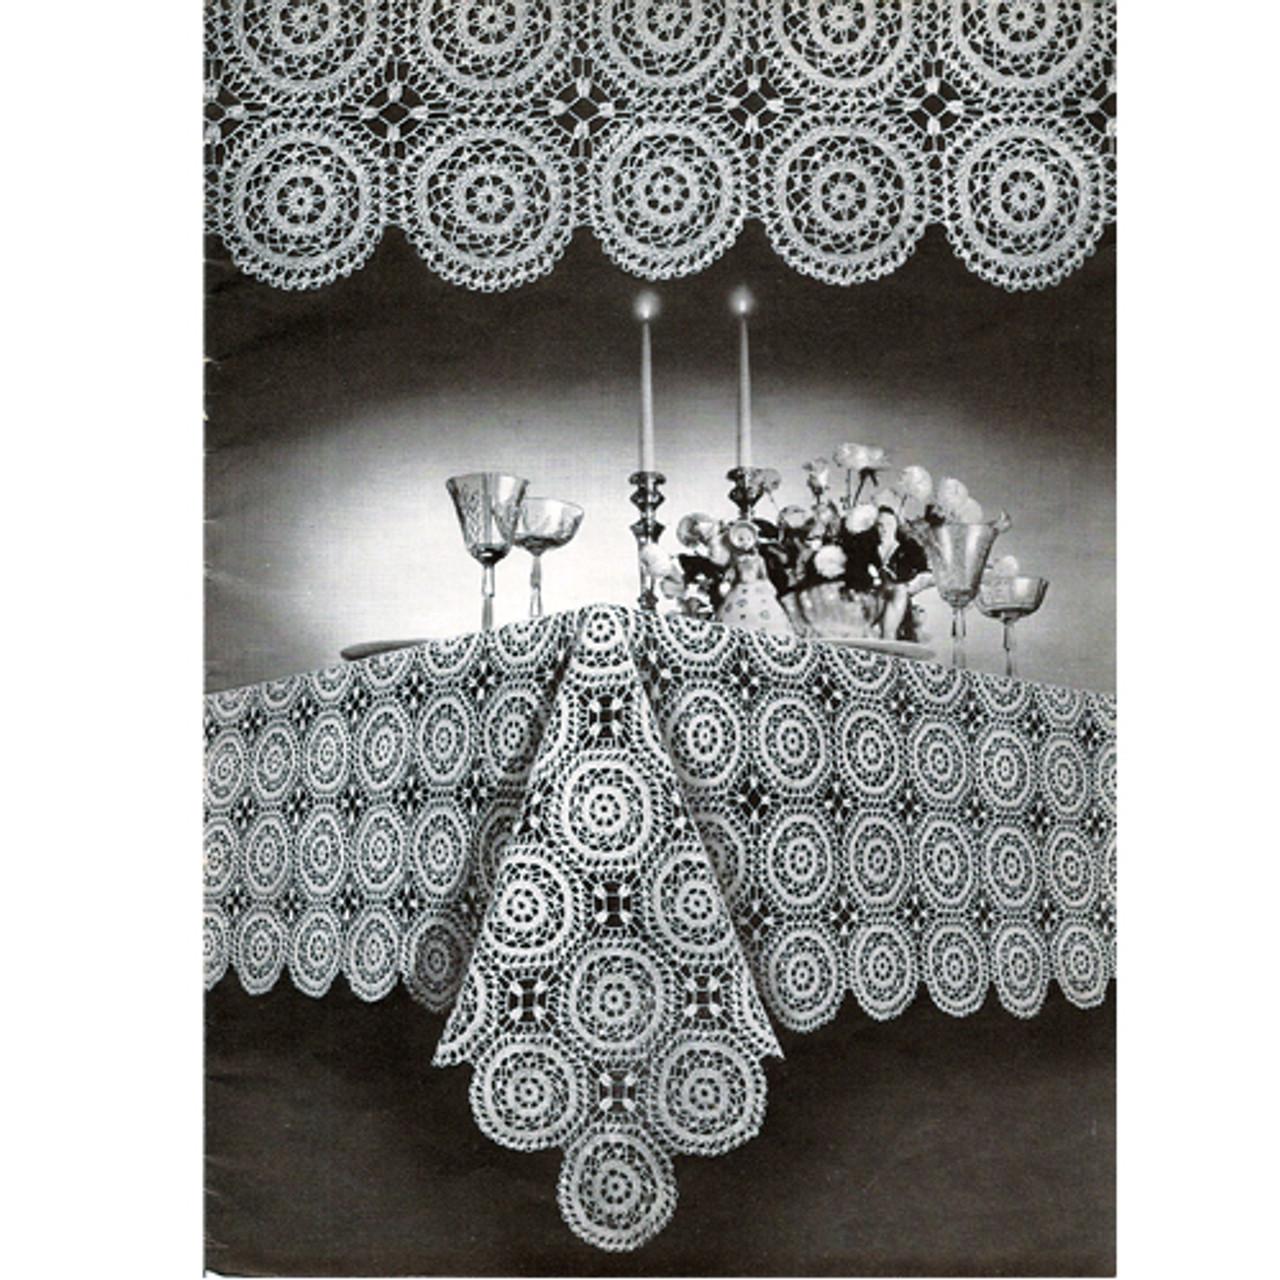 Large Round Medallion, Monterey Crochet Tablecloth